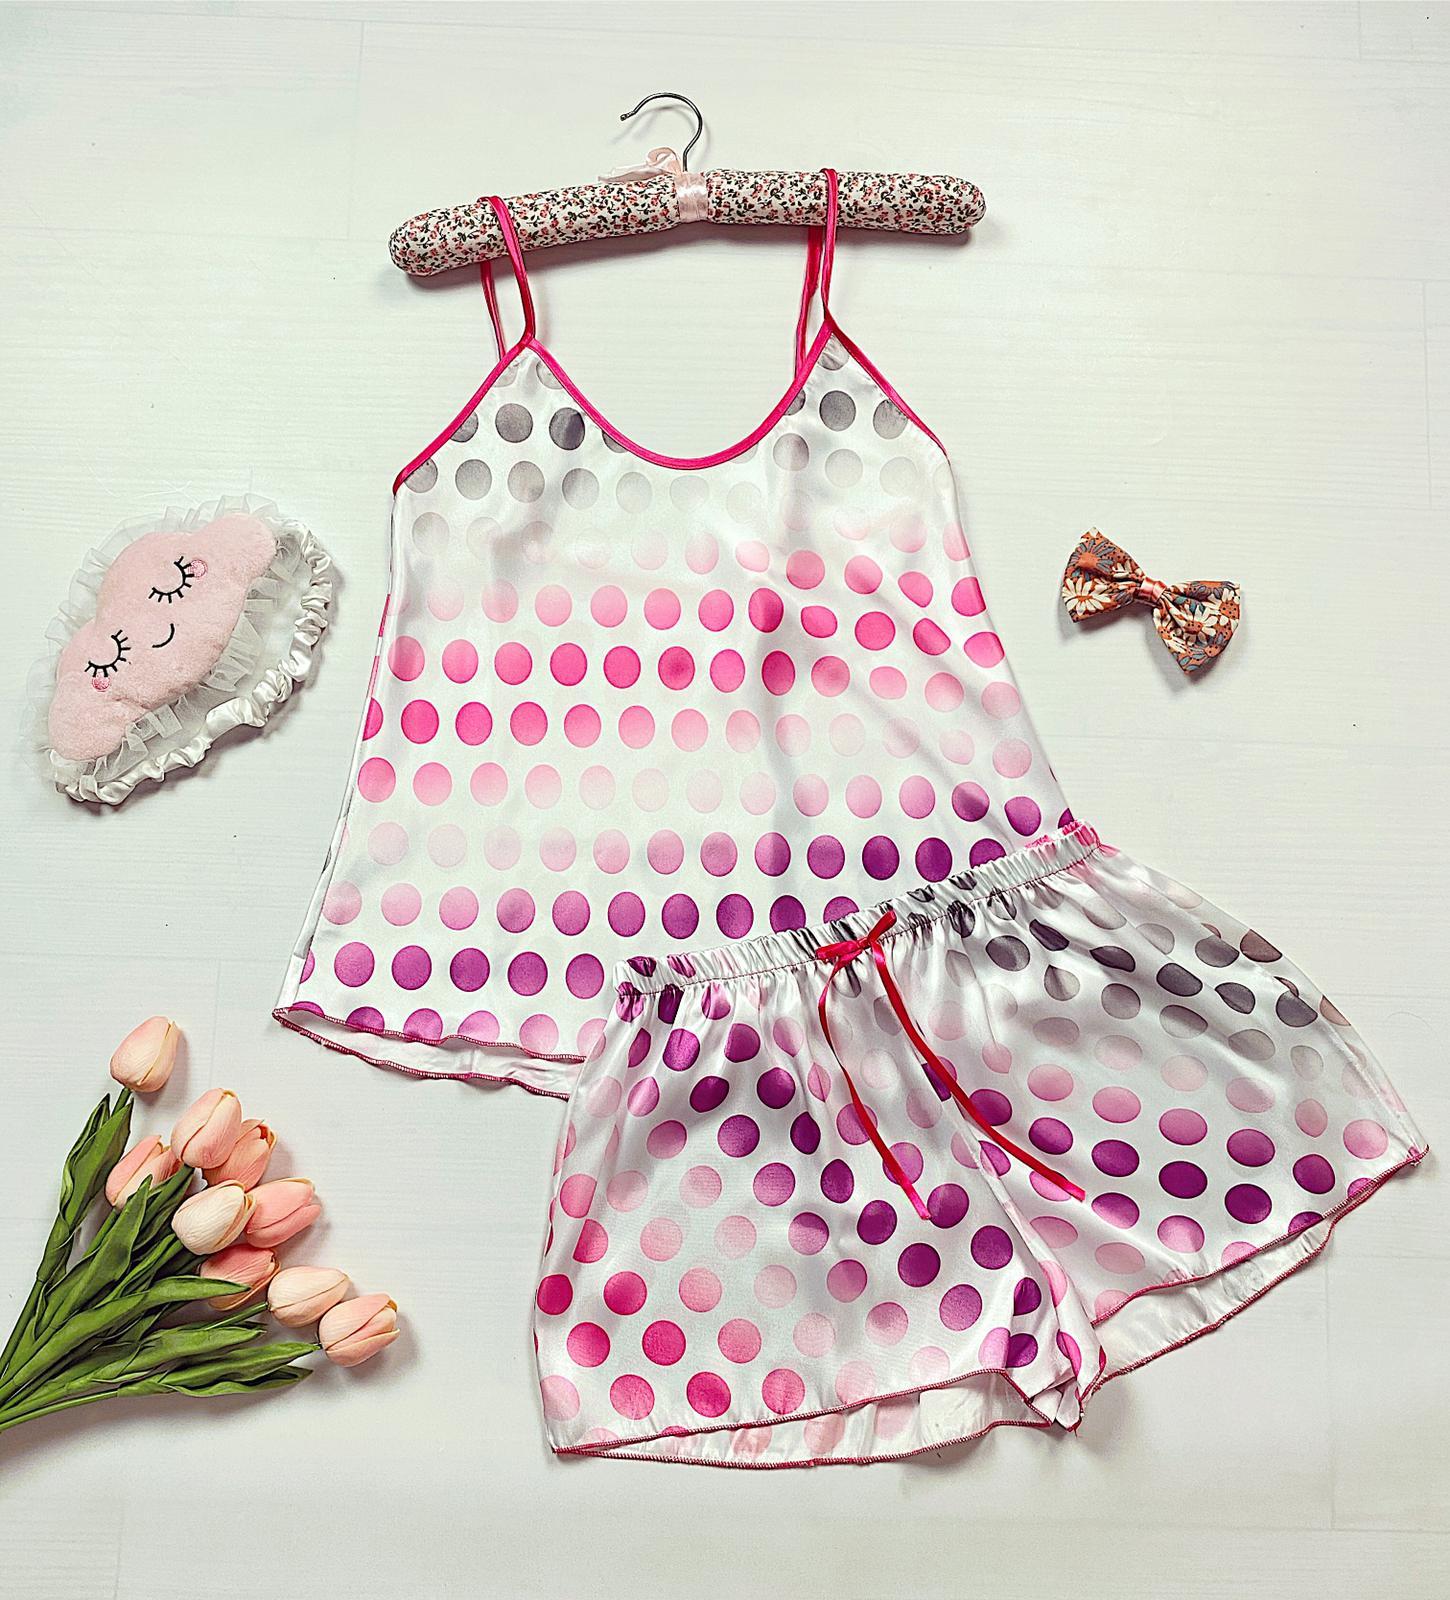 Compleu pijama scurt alb din satin cu imprimeu cercuri colorate